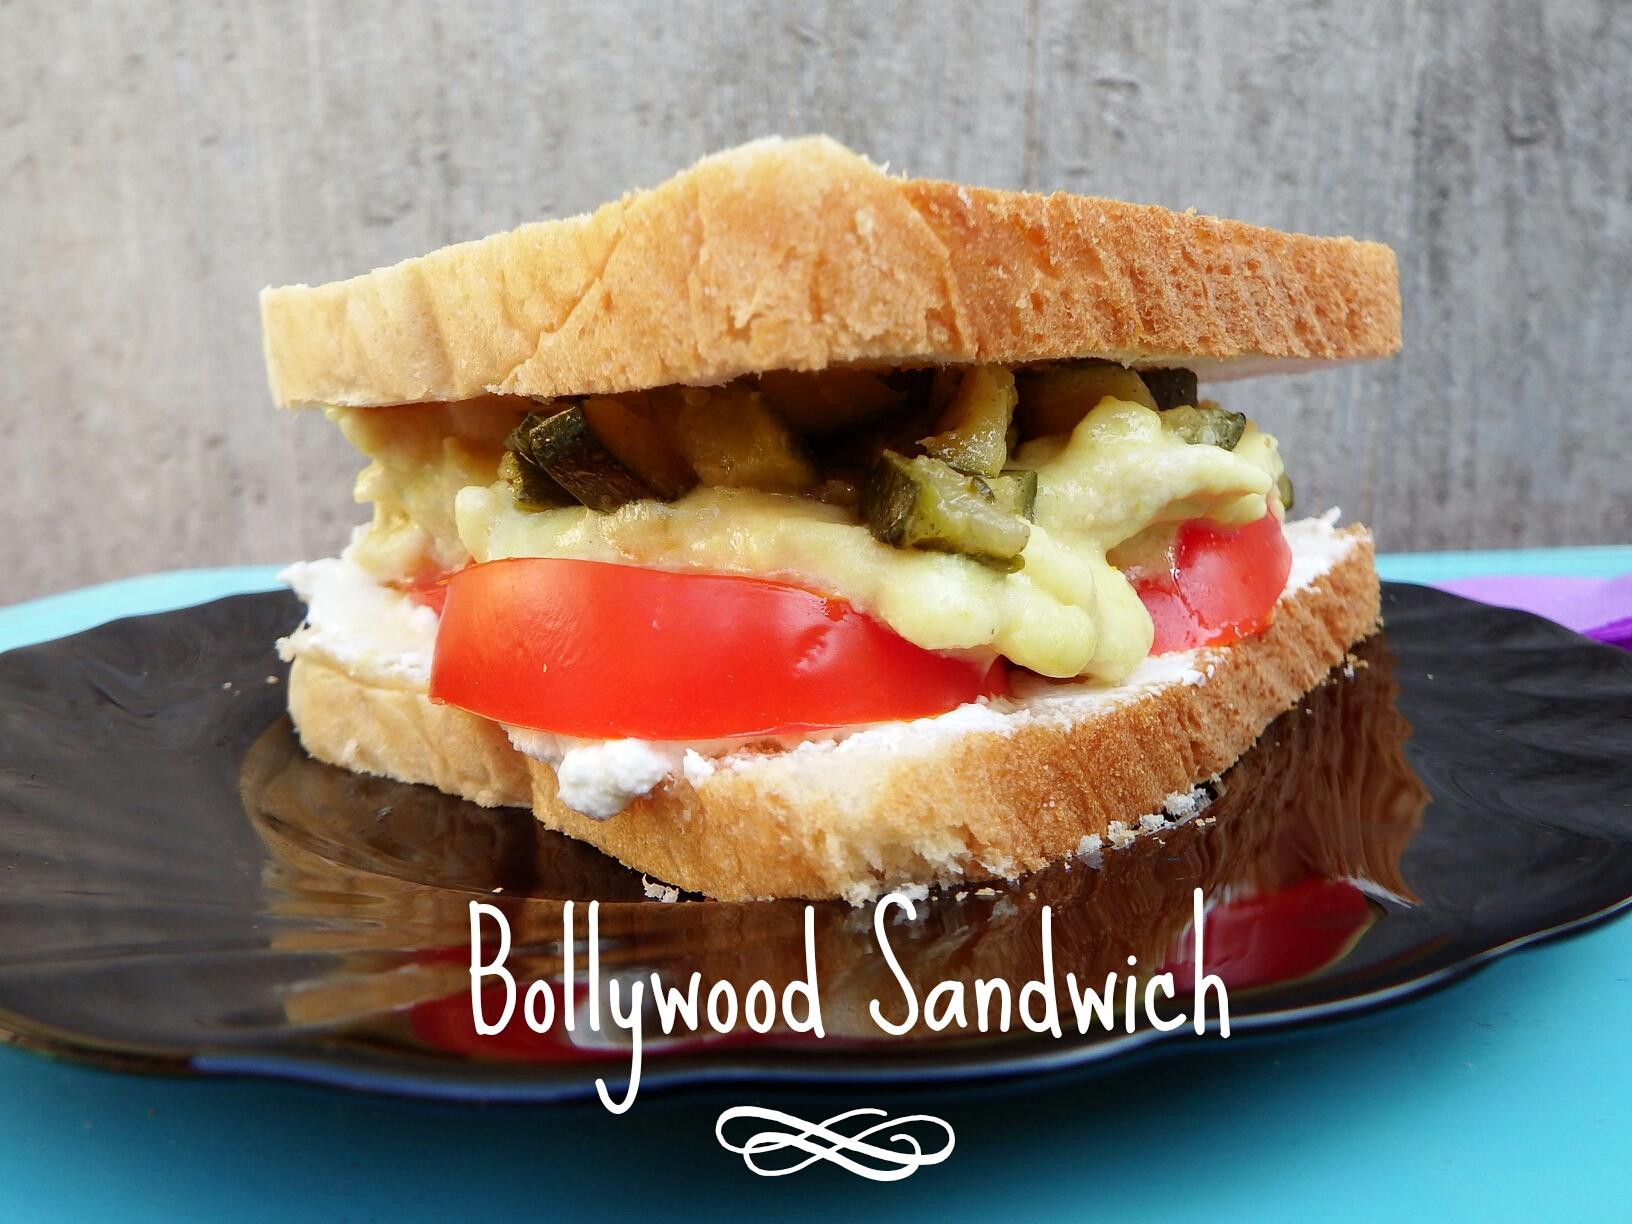 Bollywood Sandwich - panino gourmet